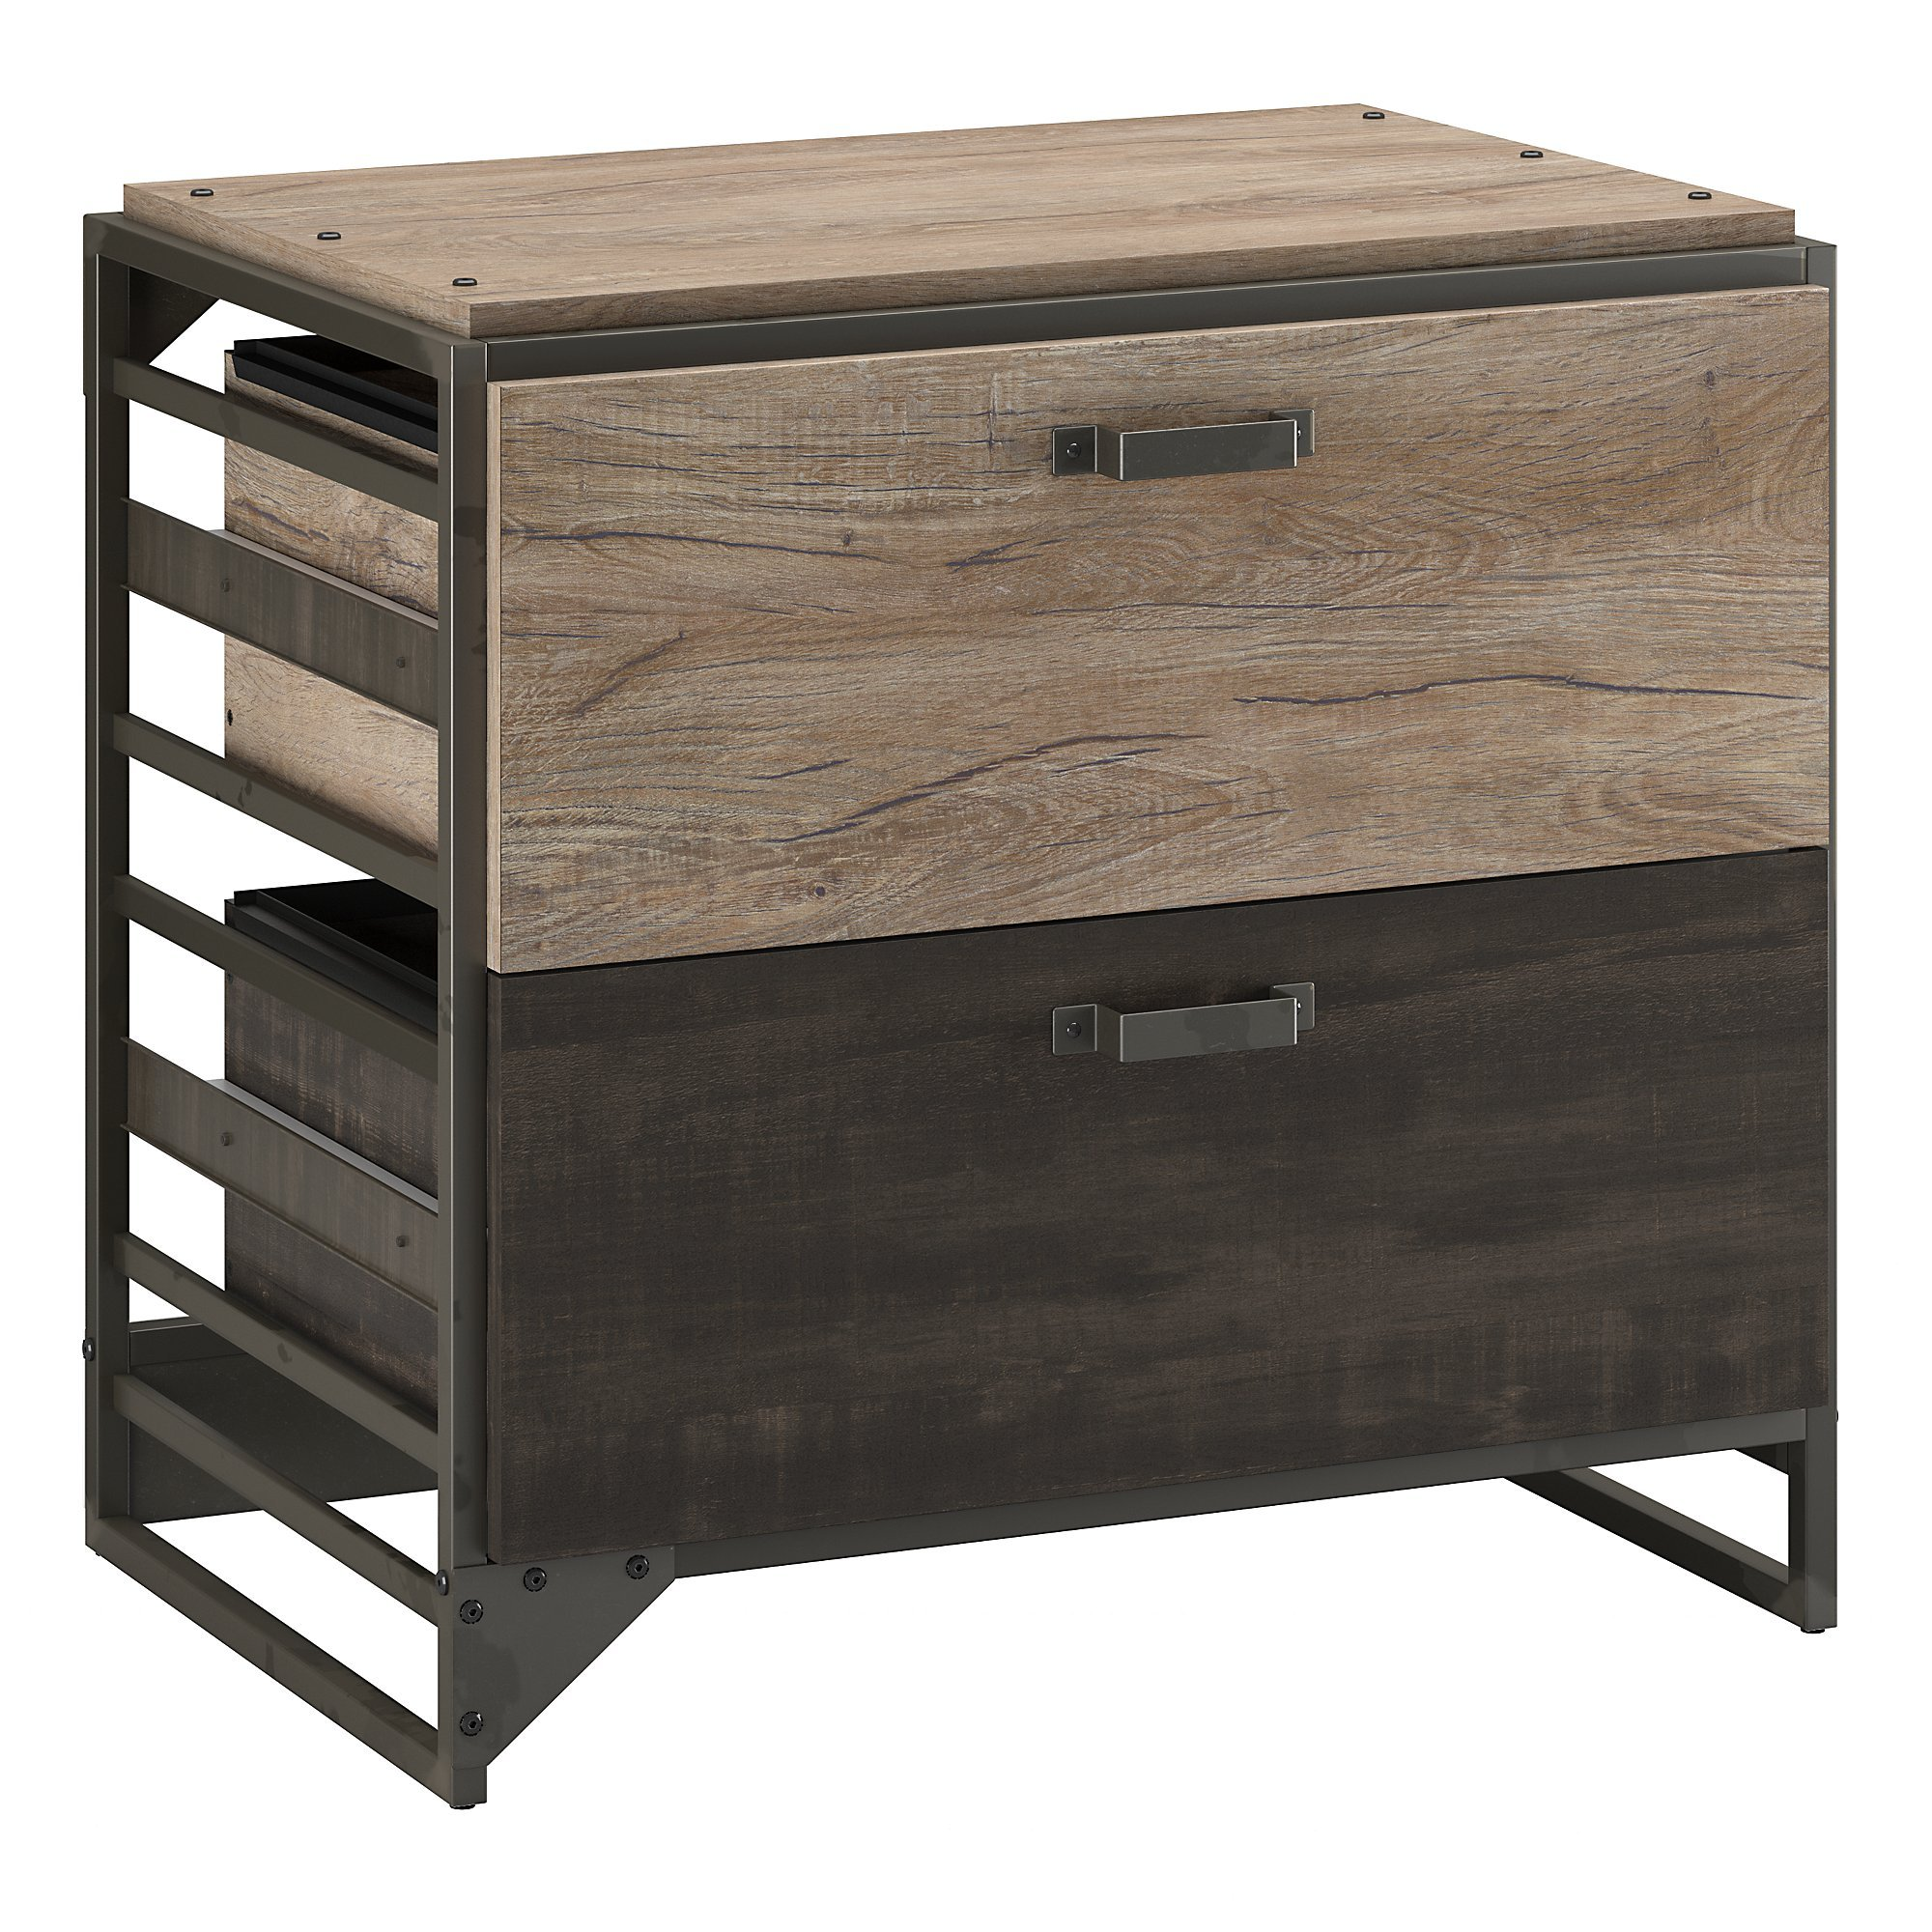 Bush Furniture Refinery Lateral File Cabinet in Rustic Gray by Bush Furniture